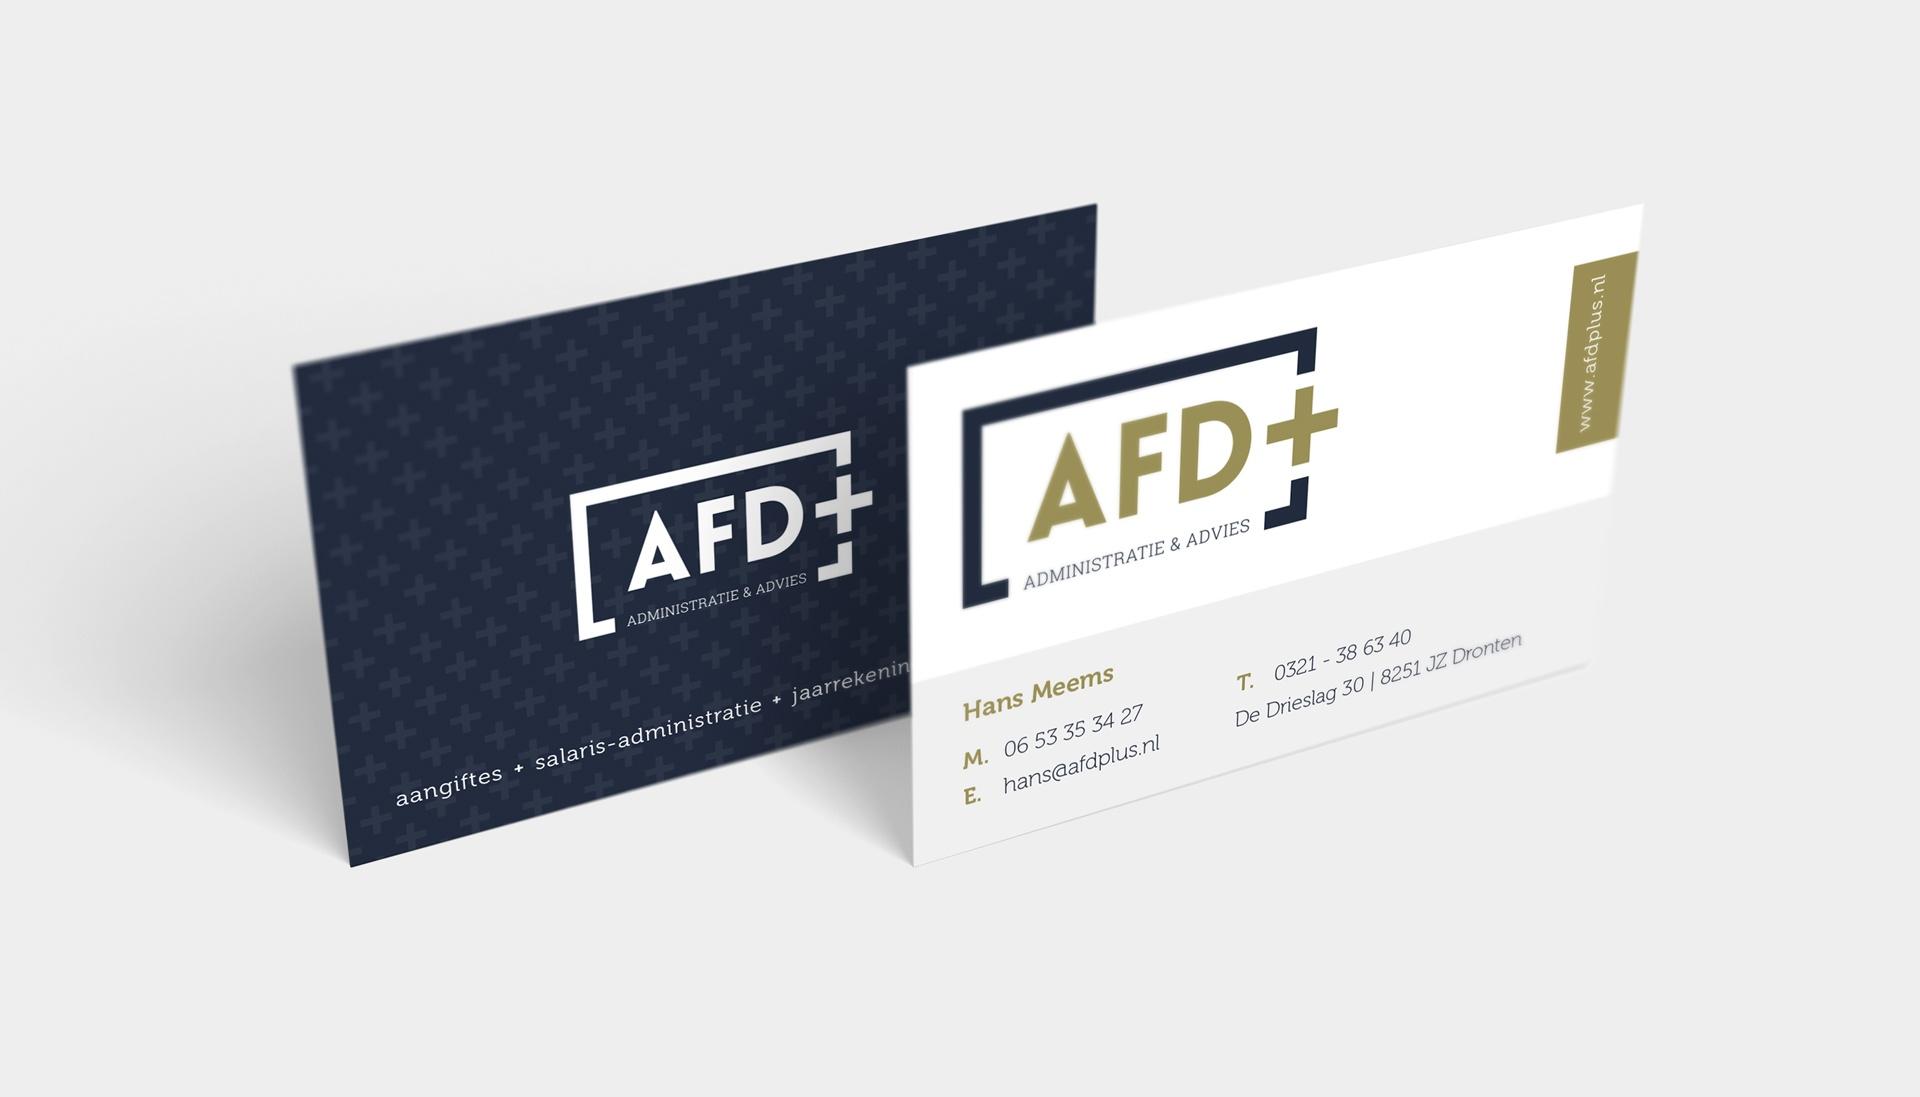 AFD+-Visitekaartje-MU